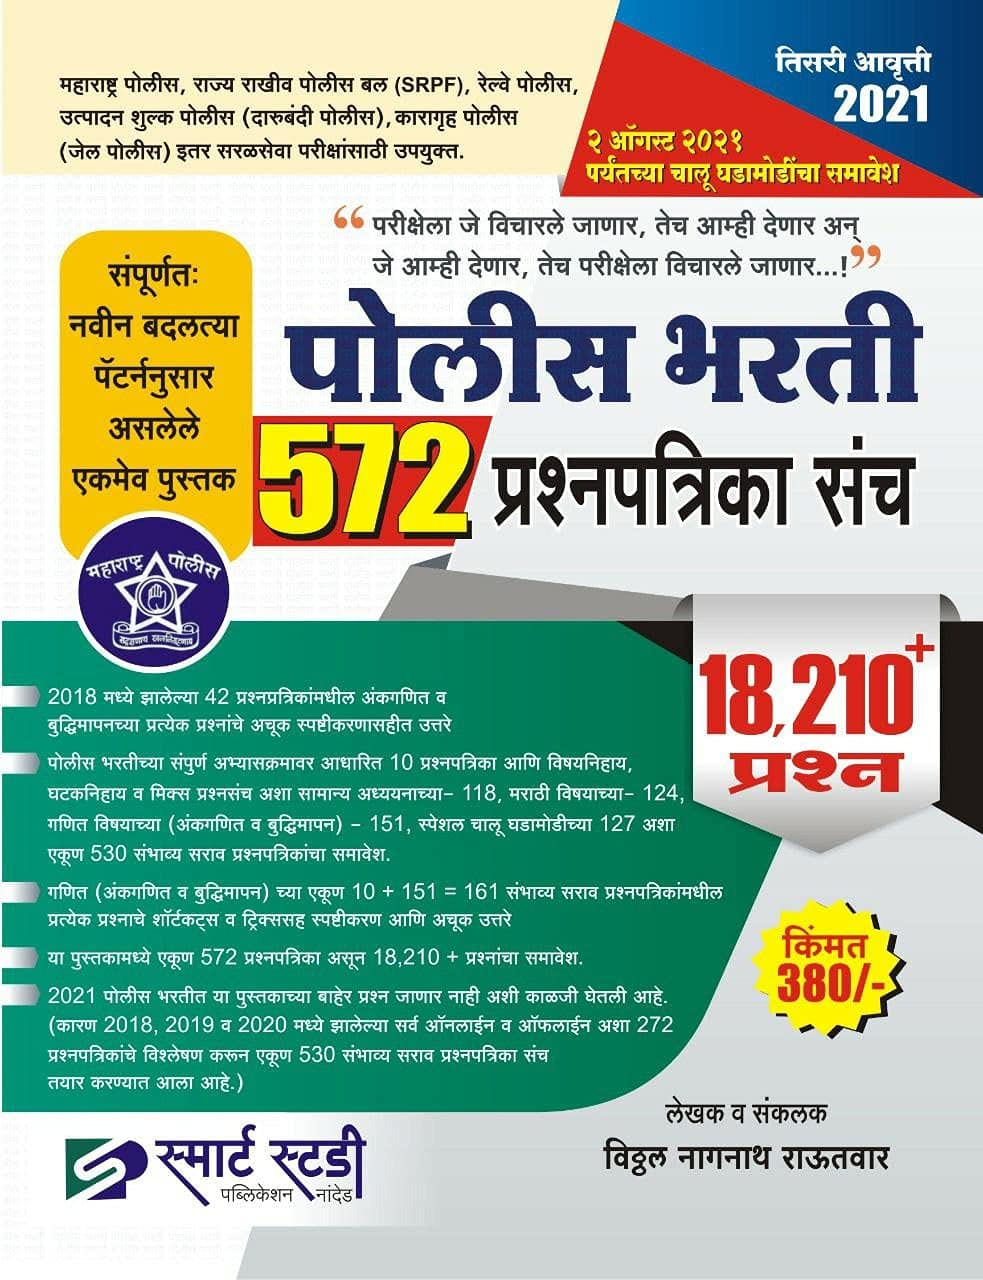 Smart Study Police Bharti 572 Prashnapatrika Sanch – 18,210+ Prashna Paperback – 6 August 2021